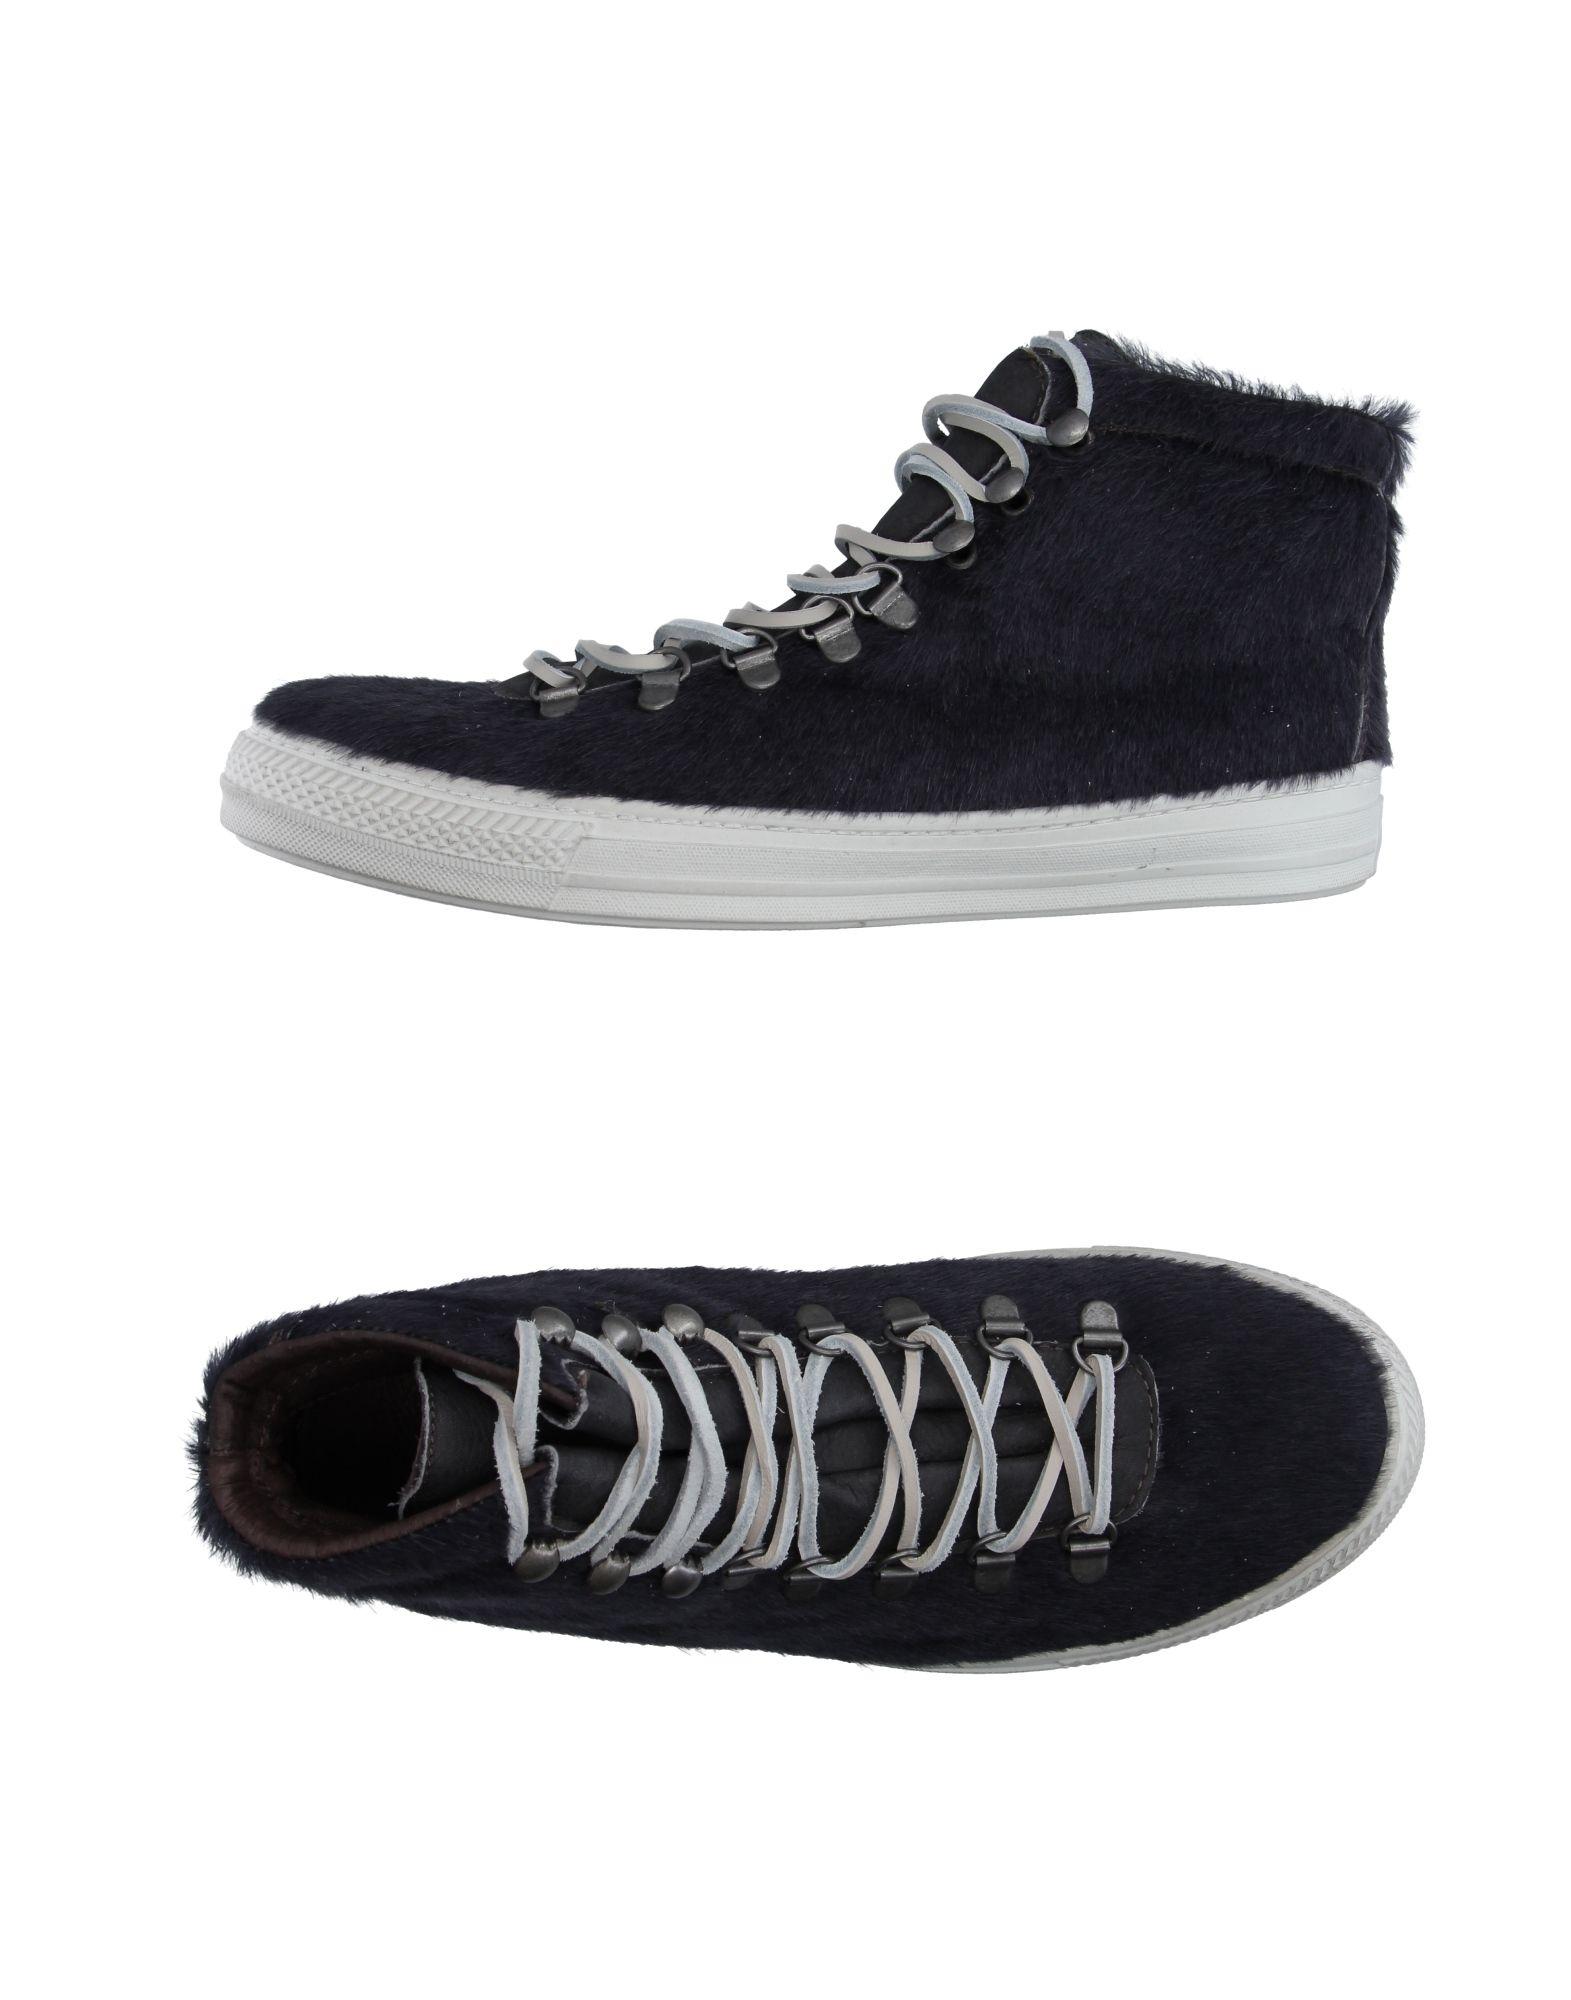 Sneakers Lerews Homme - Sneakers Lerews  Anthracite Remise de marque